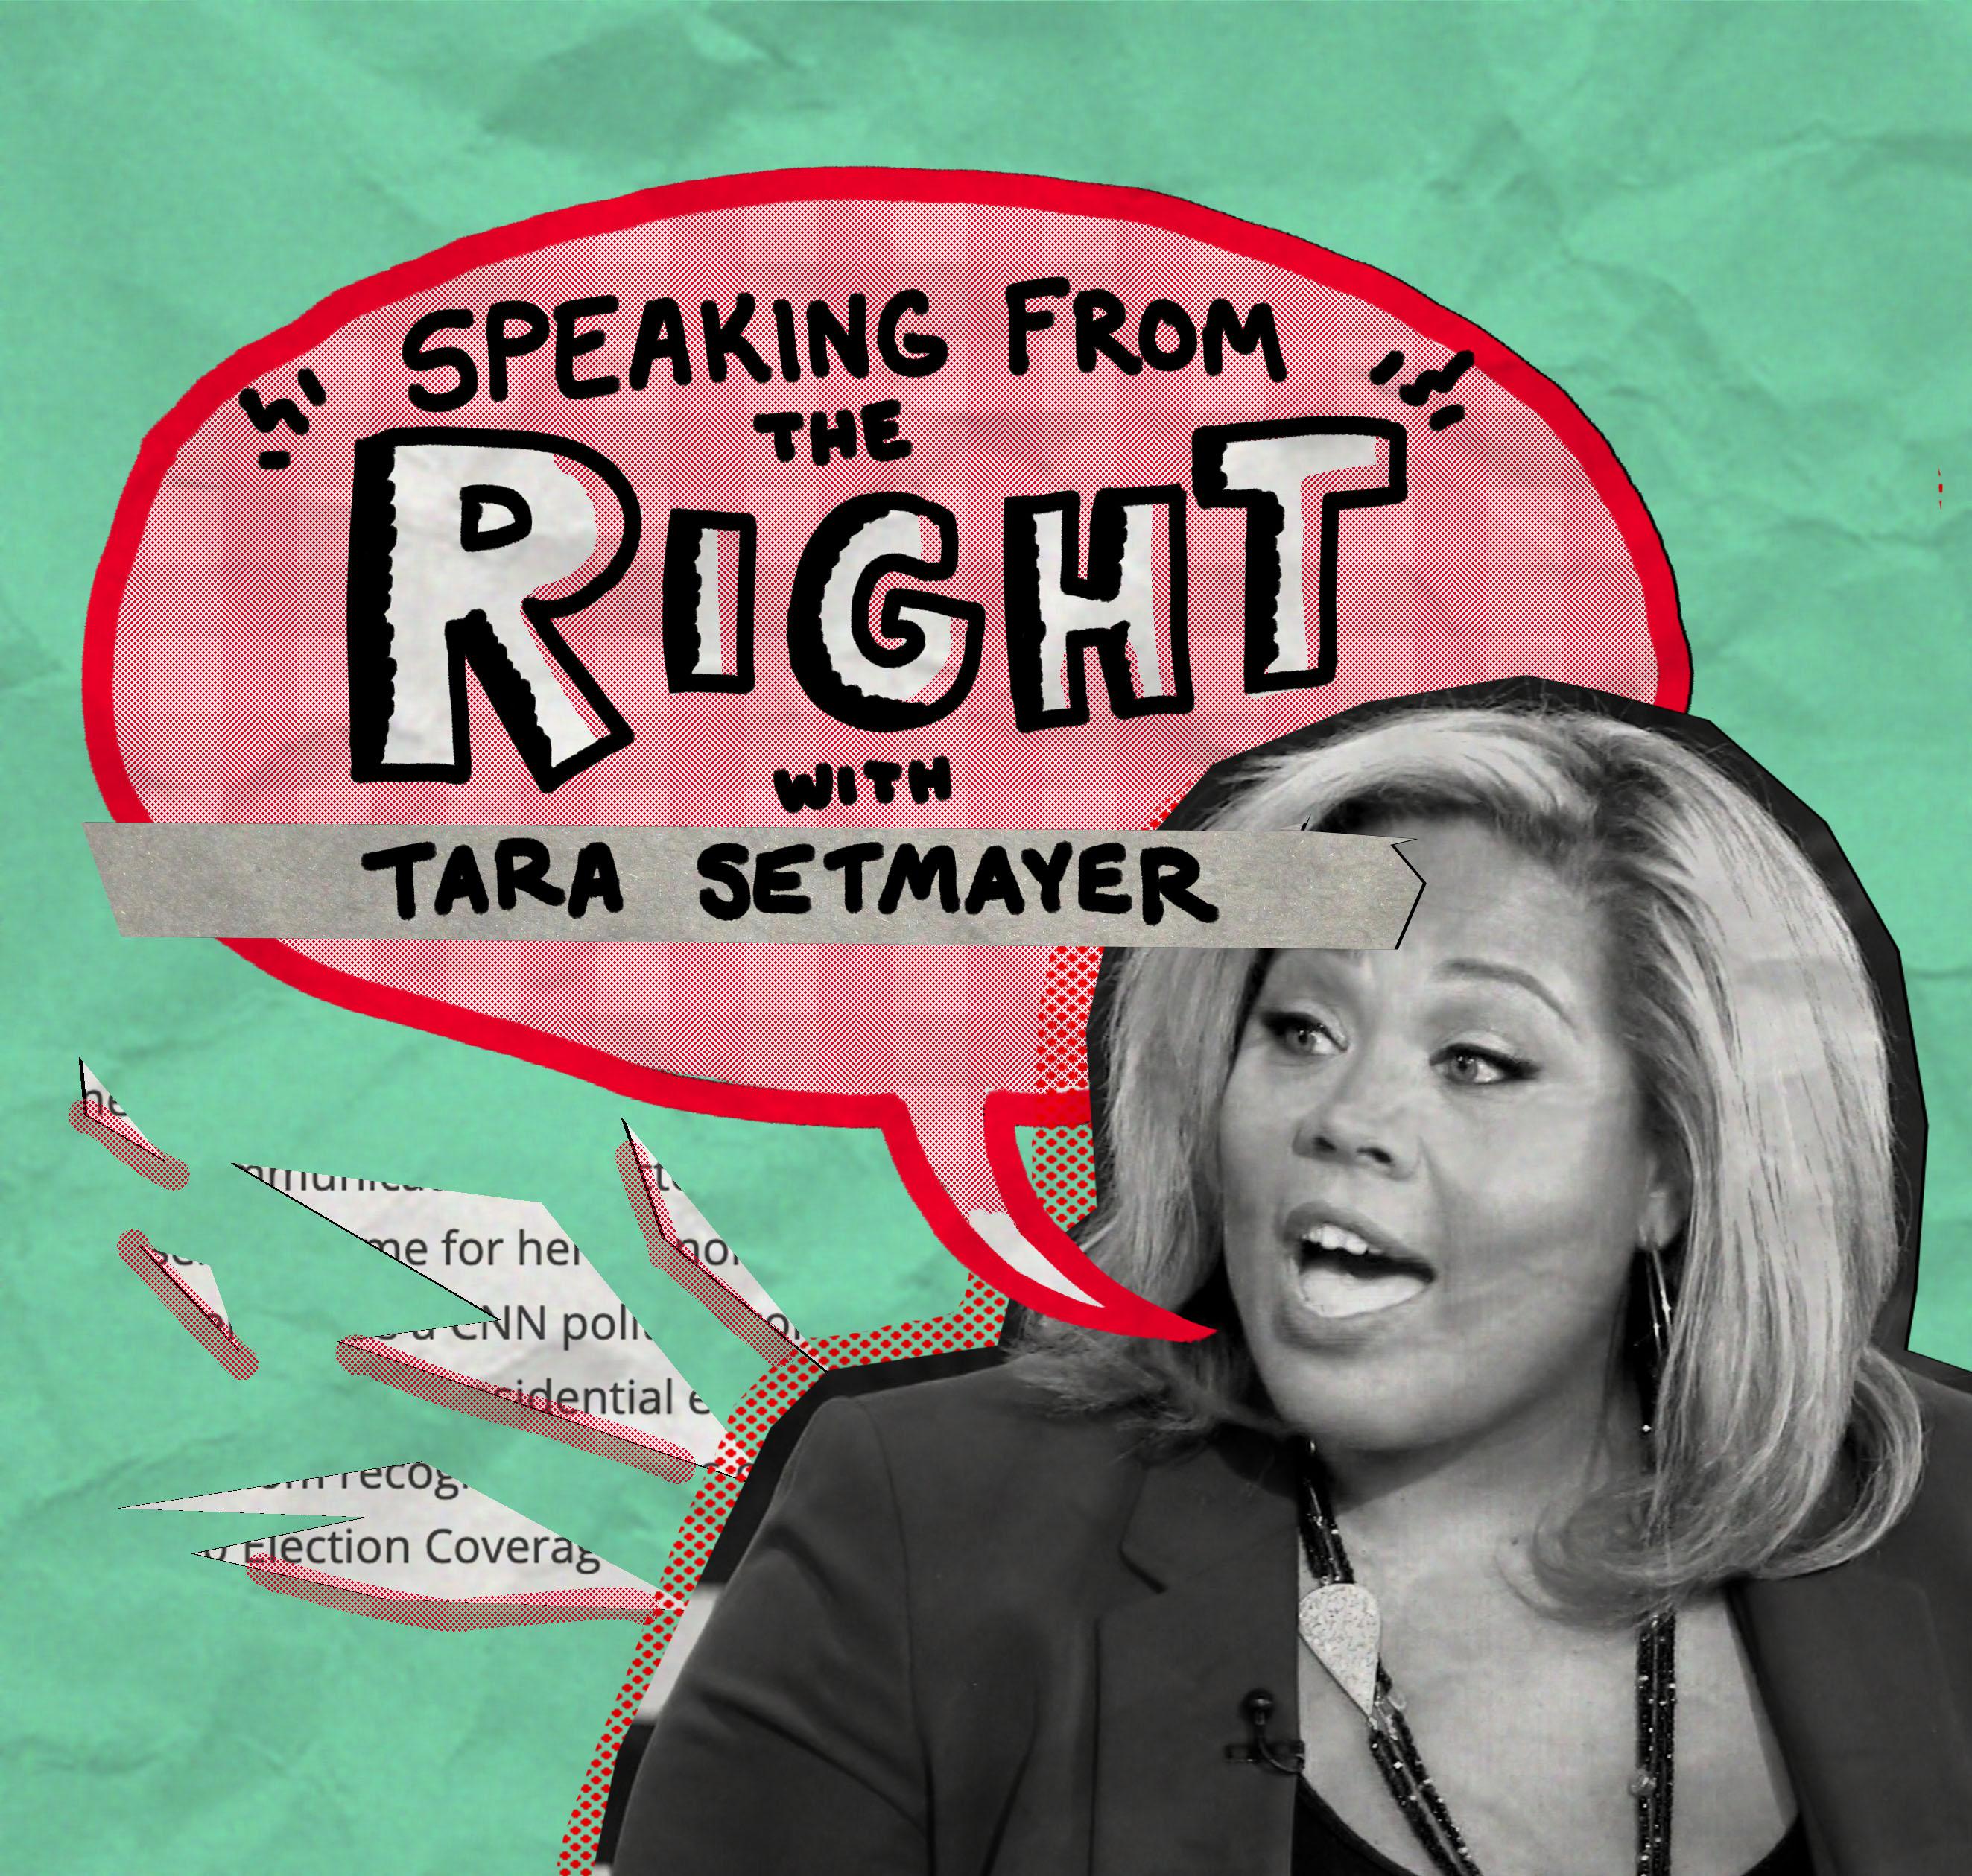 National Agenda 2019: Tara Setmeyer discusses modern conservatism